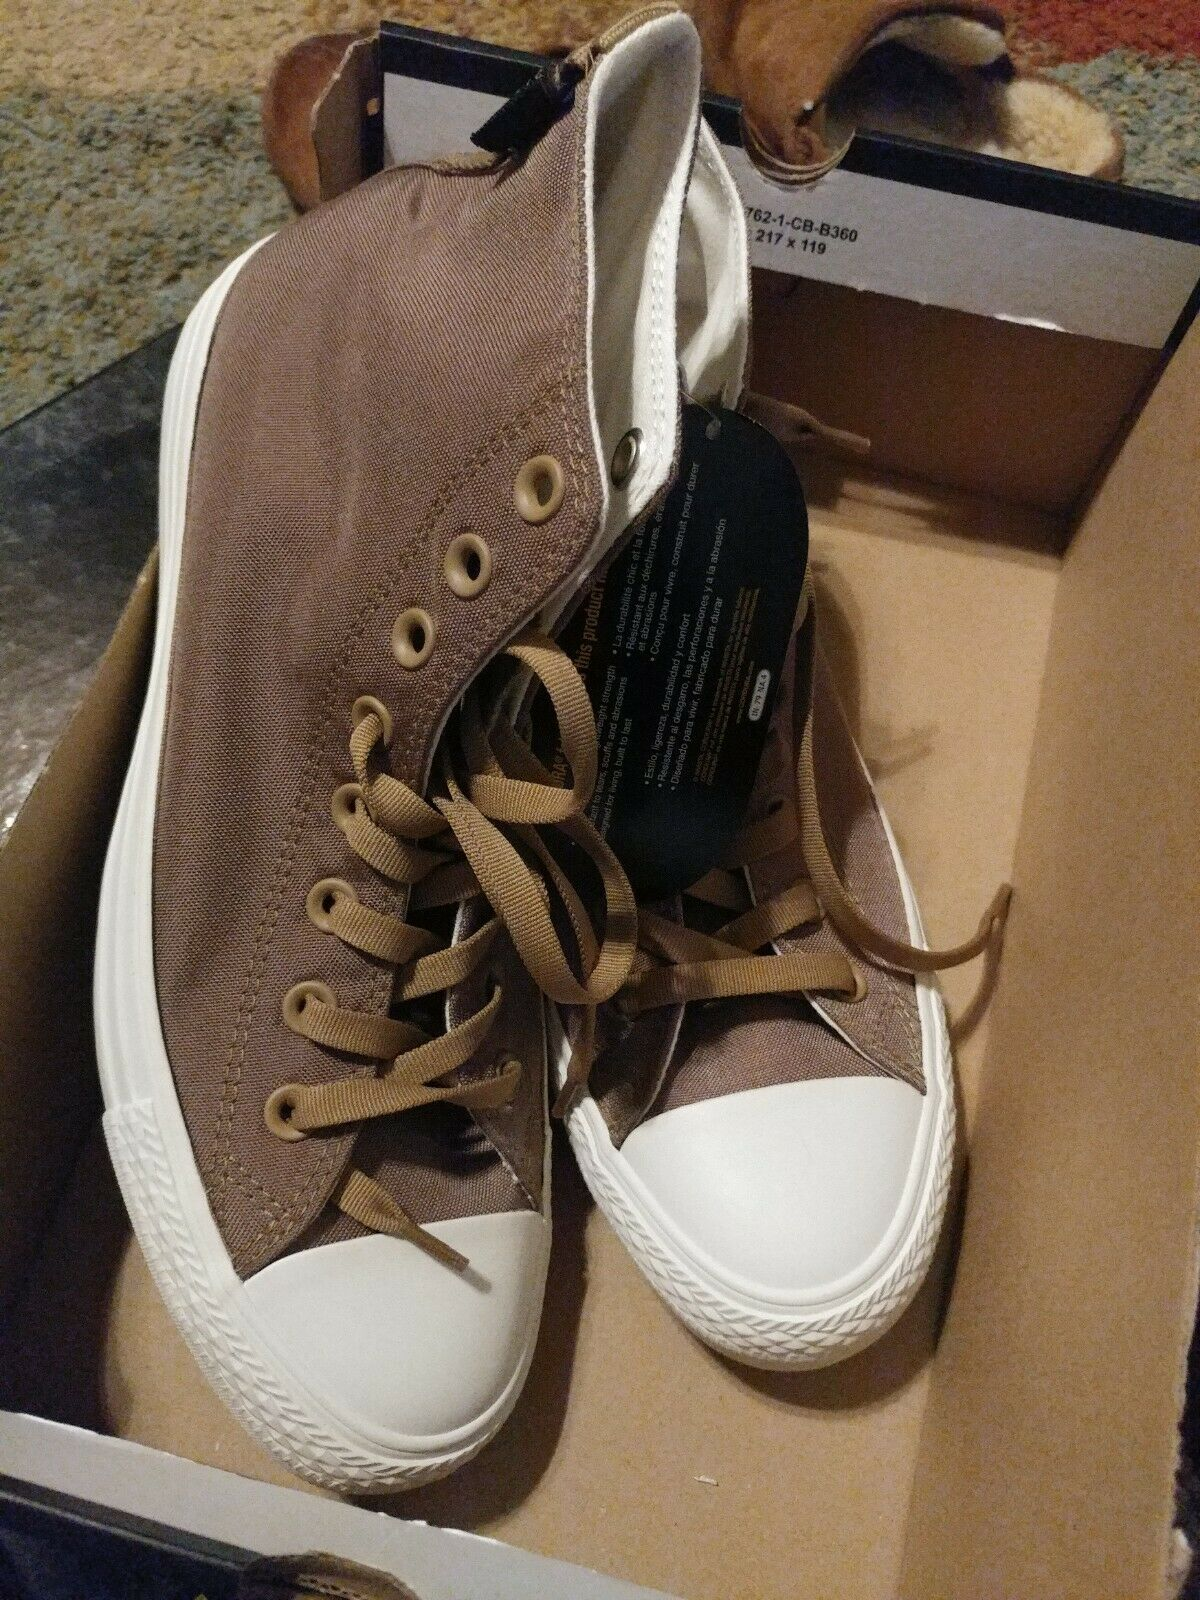 BRAND NEW IN BOX CONVERSE 161430C Teak Chuck Hi Sneakers size 8.5 mens 10.5 wm